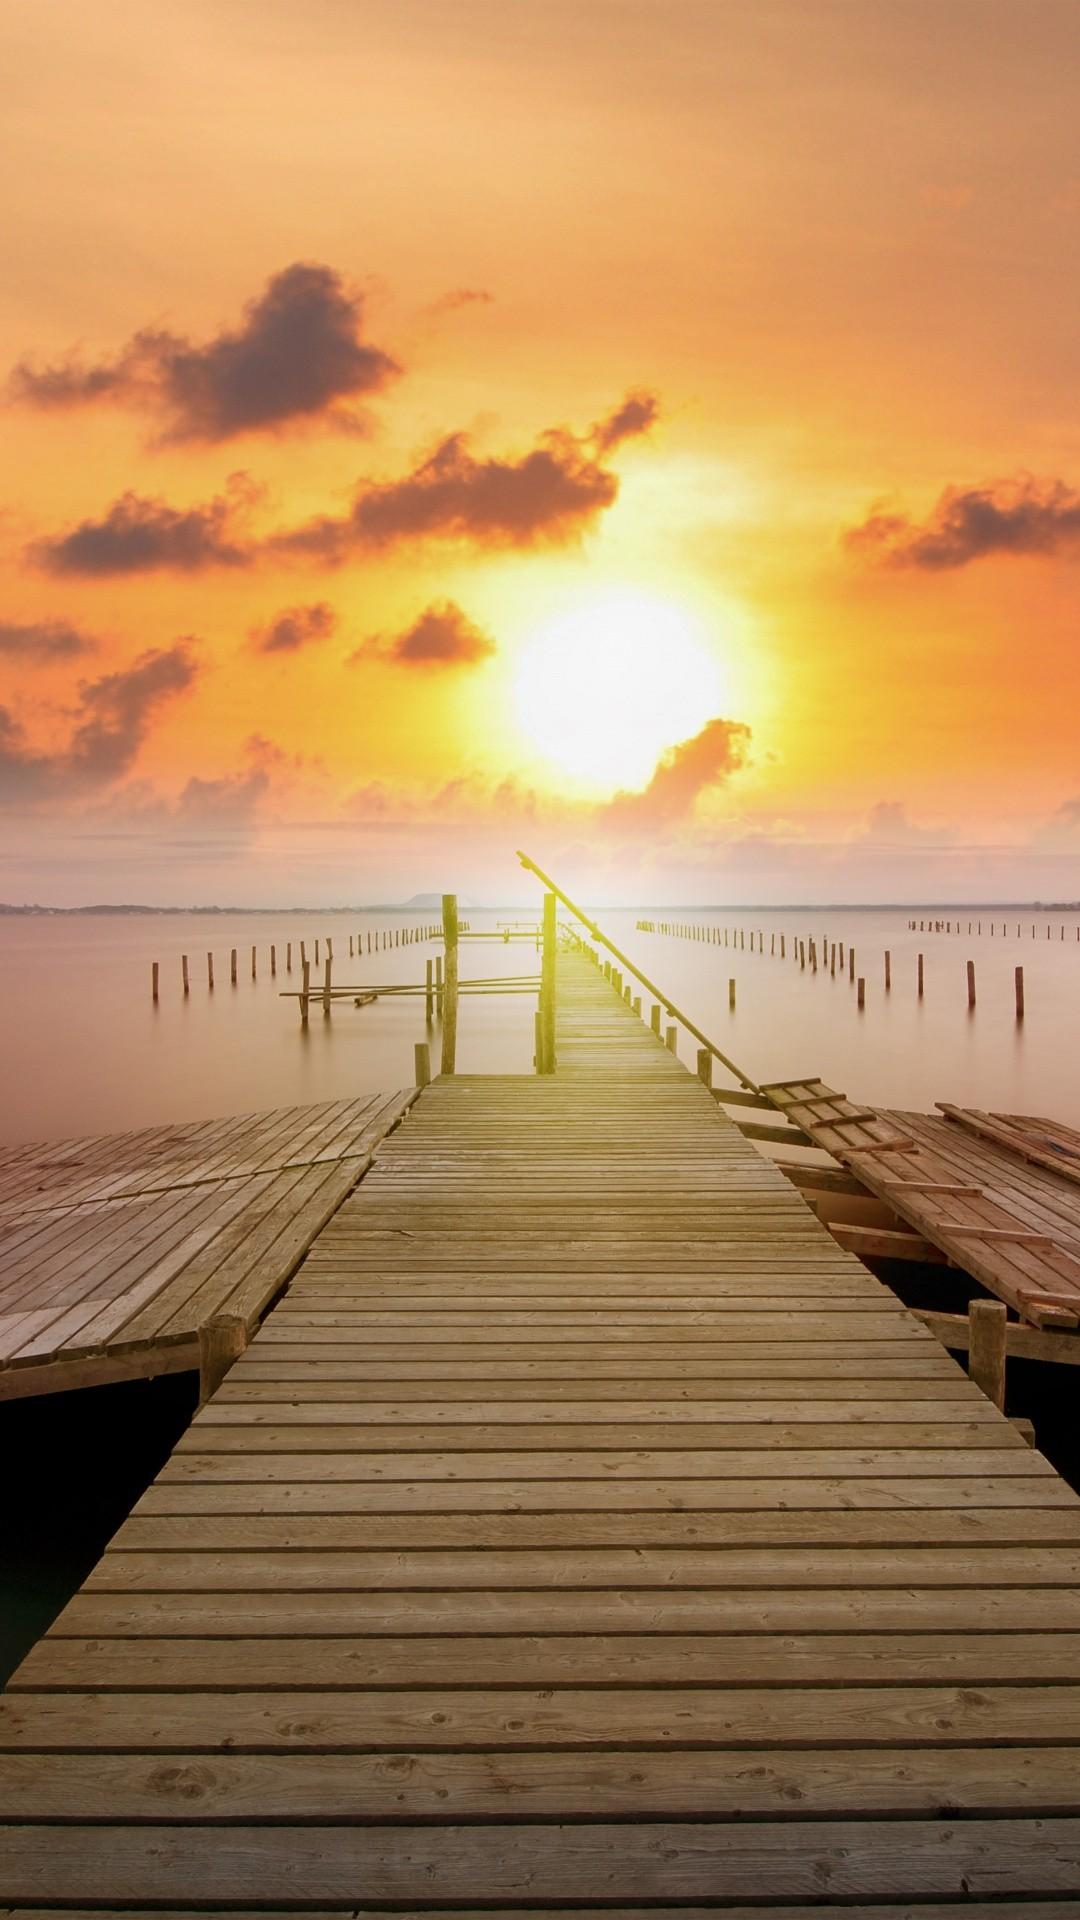 Sunrise wallpaper for iPhone